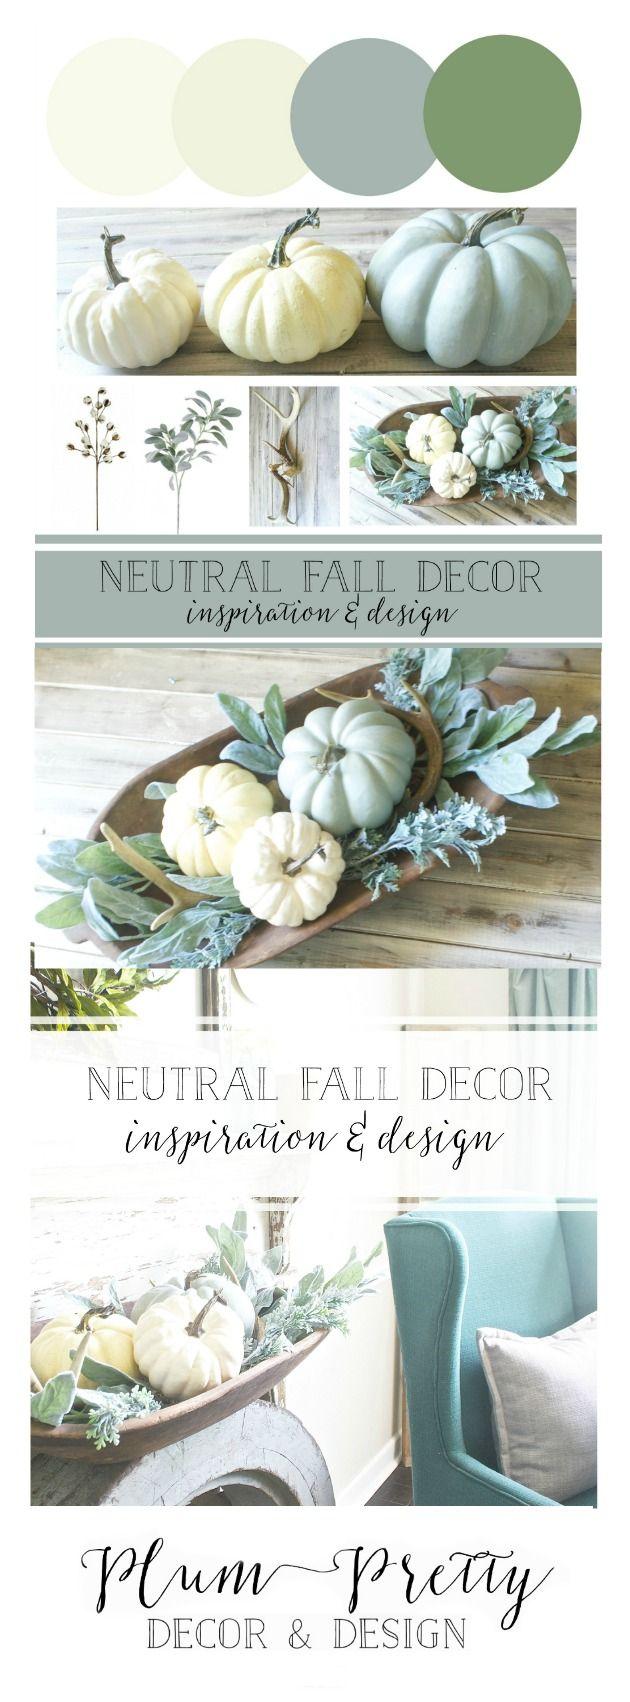 Plum Pretty Decor & Design Co.Neutral Fall Decor Plans- Inspiration & Design —